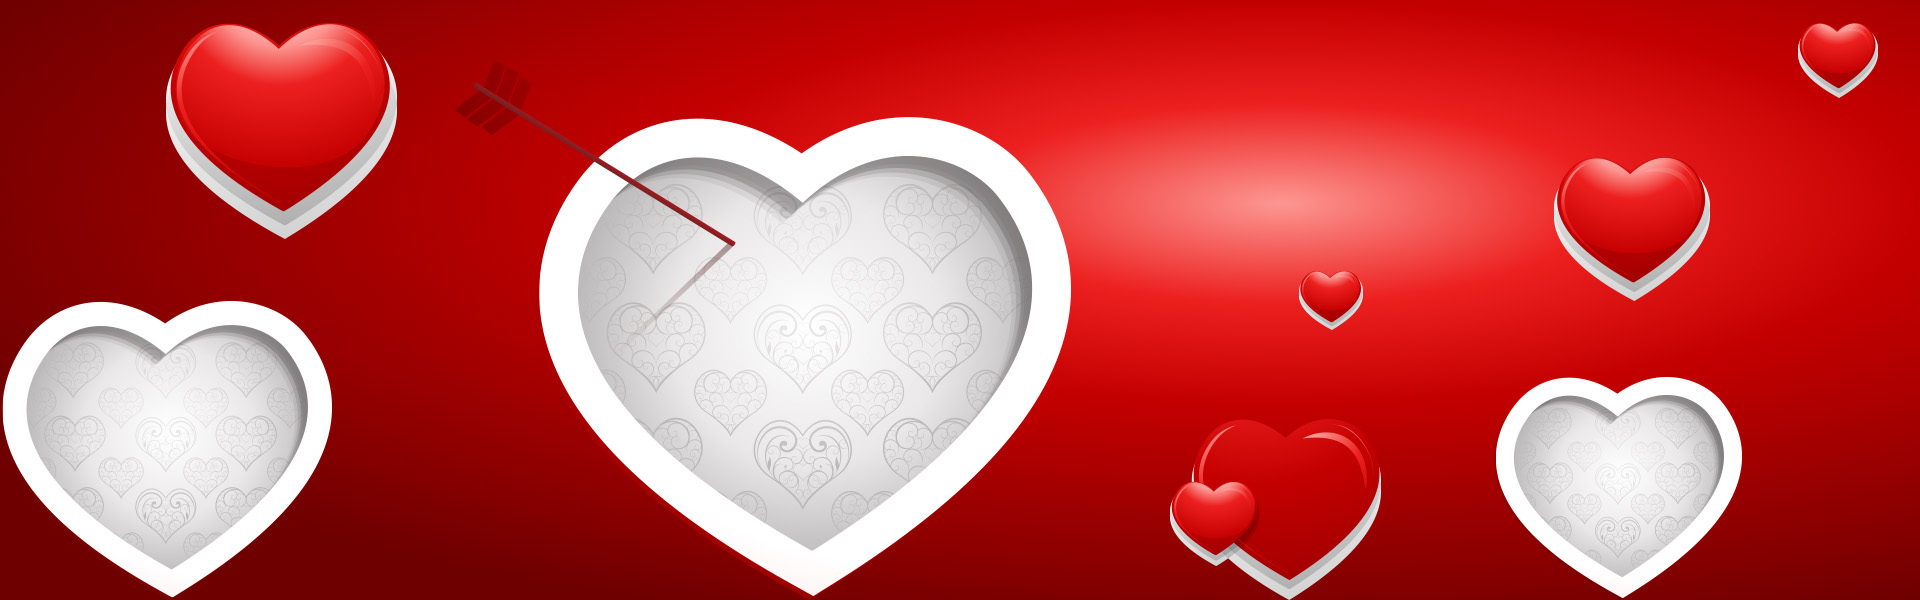 Faccine Emoticons San Valentino